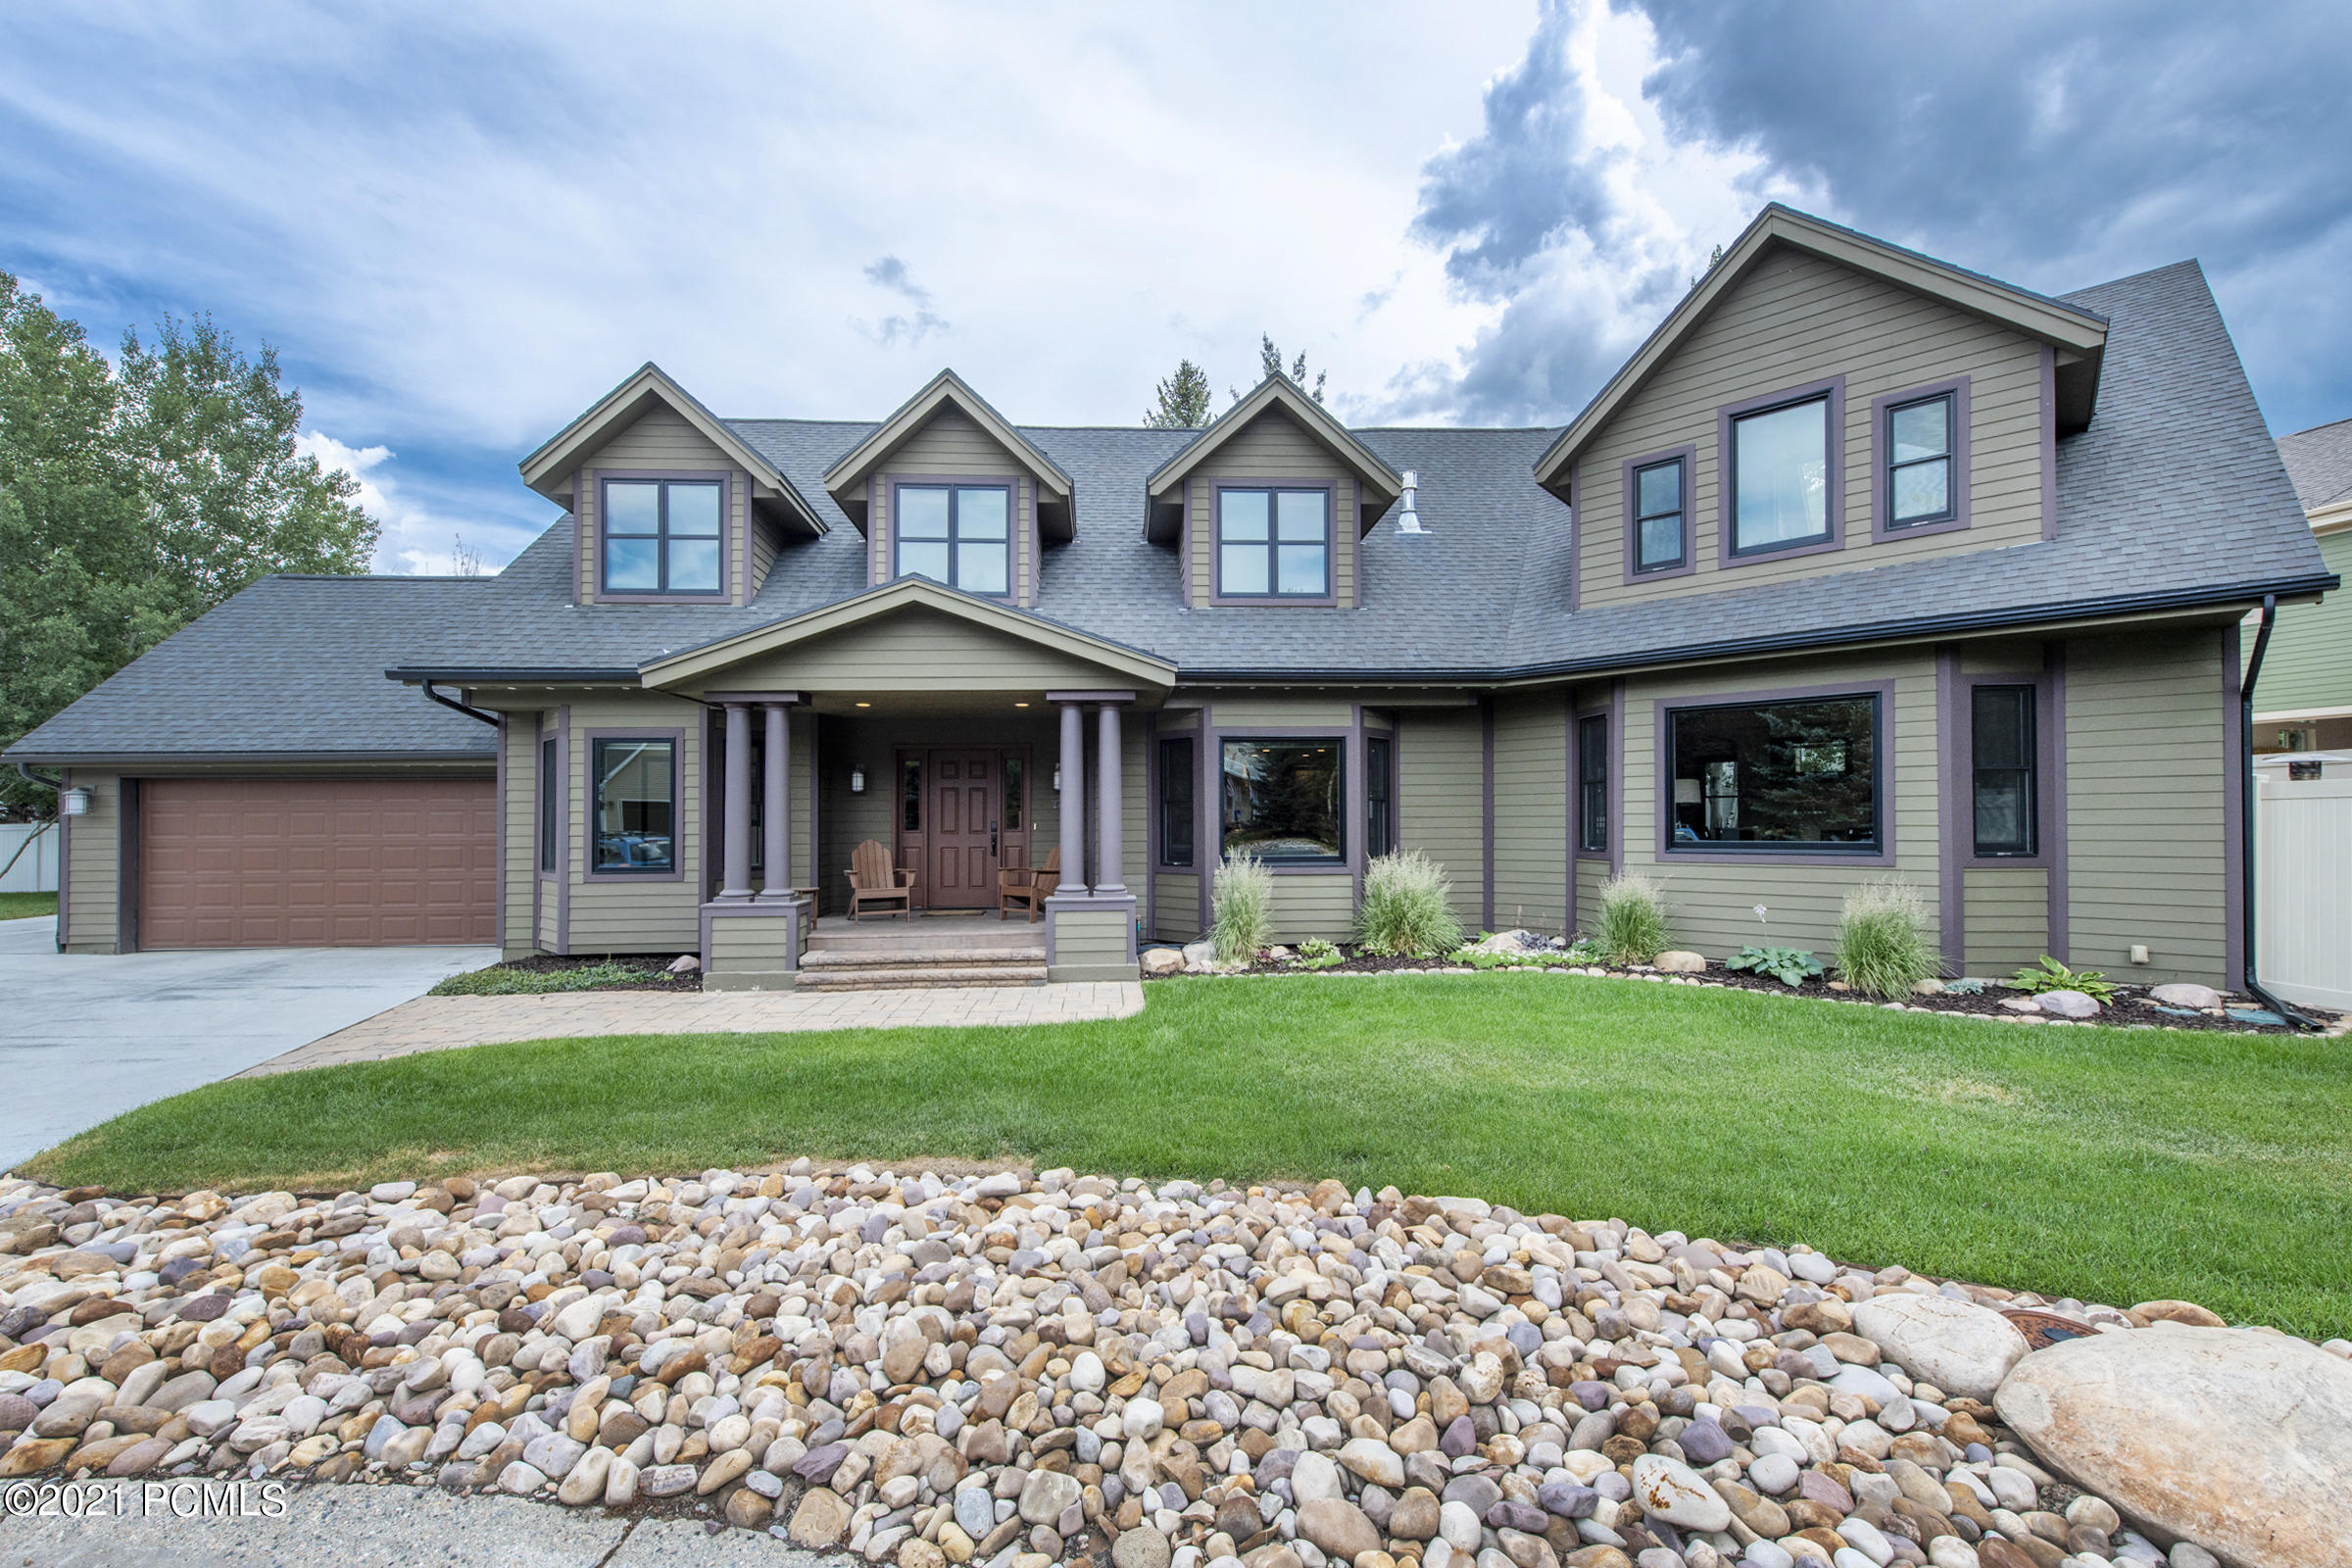 2550 Geronimo Court, Park City, Utah 84060, 4 Bedrooms Bedrooms, ,4 BathroomsBathrooms,Single Family,For Sale,Geronimo,12103100